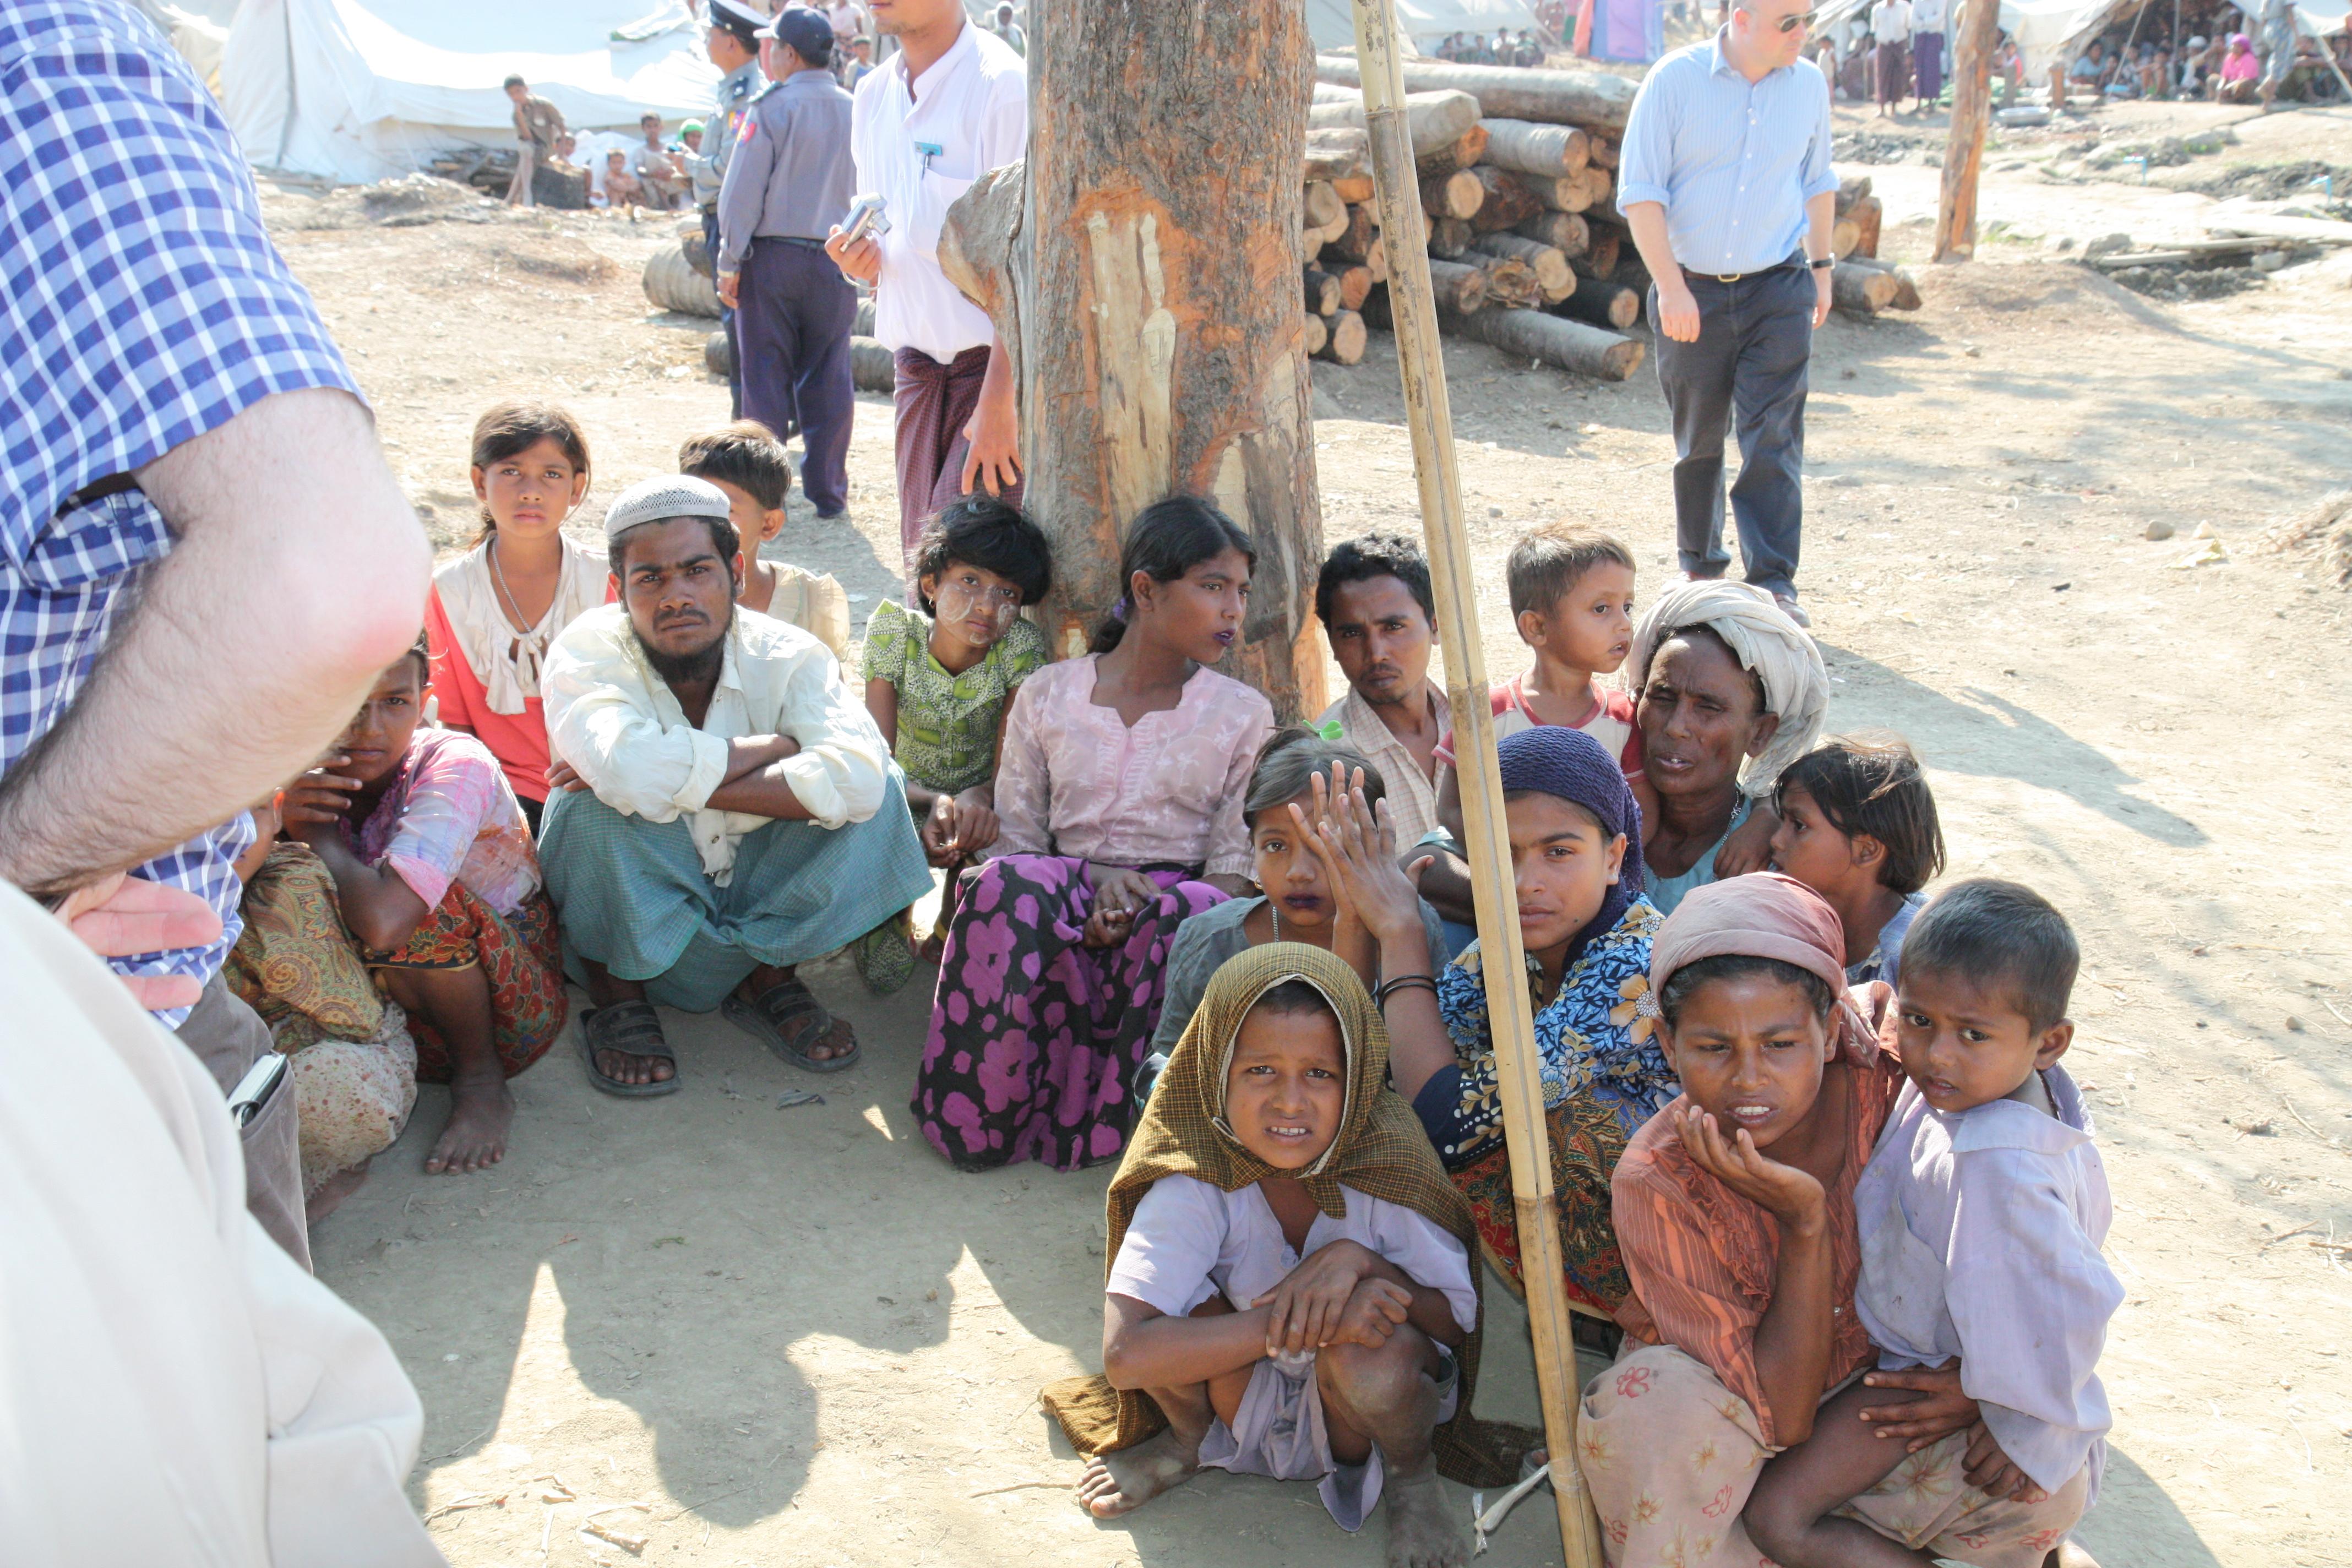 UN rights experts urge Myanmar to address concerns in northern Rakhine state